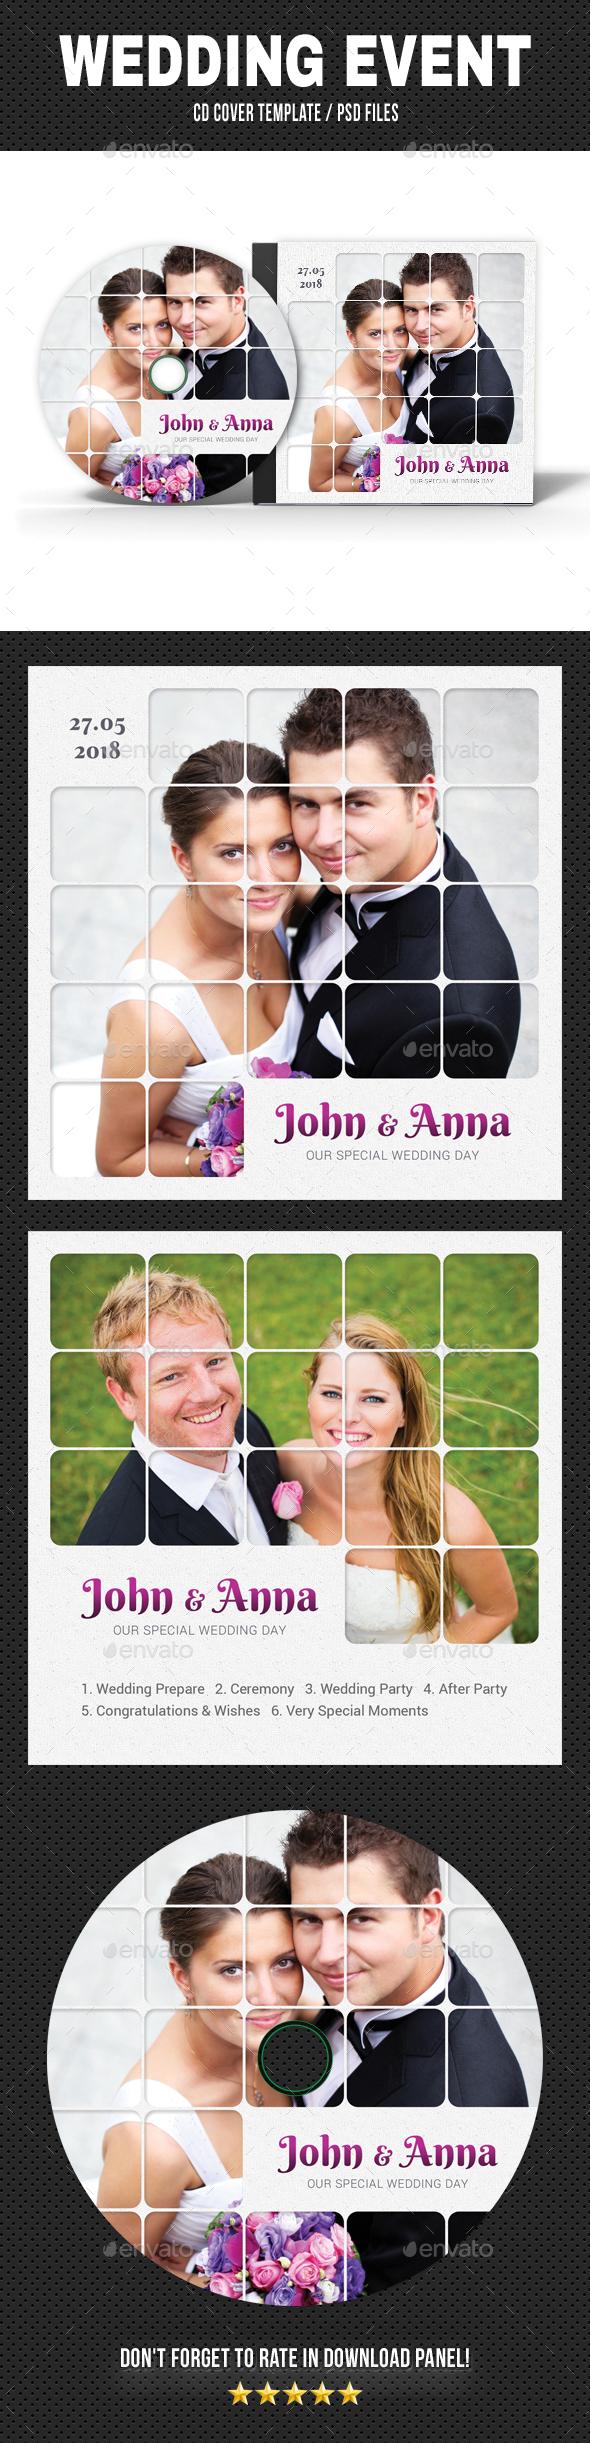 Wedding Event CD Cover v22 - CD & DVD Artwork Print Templates